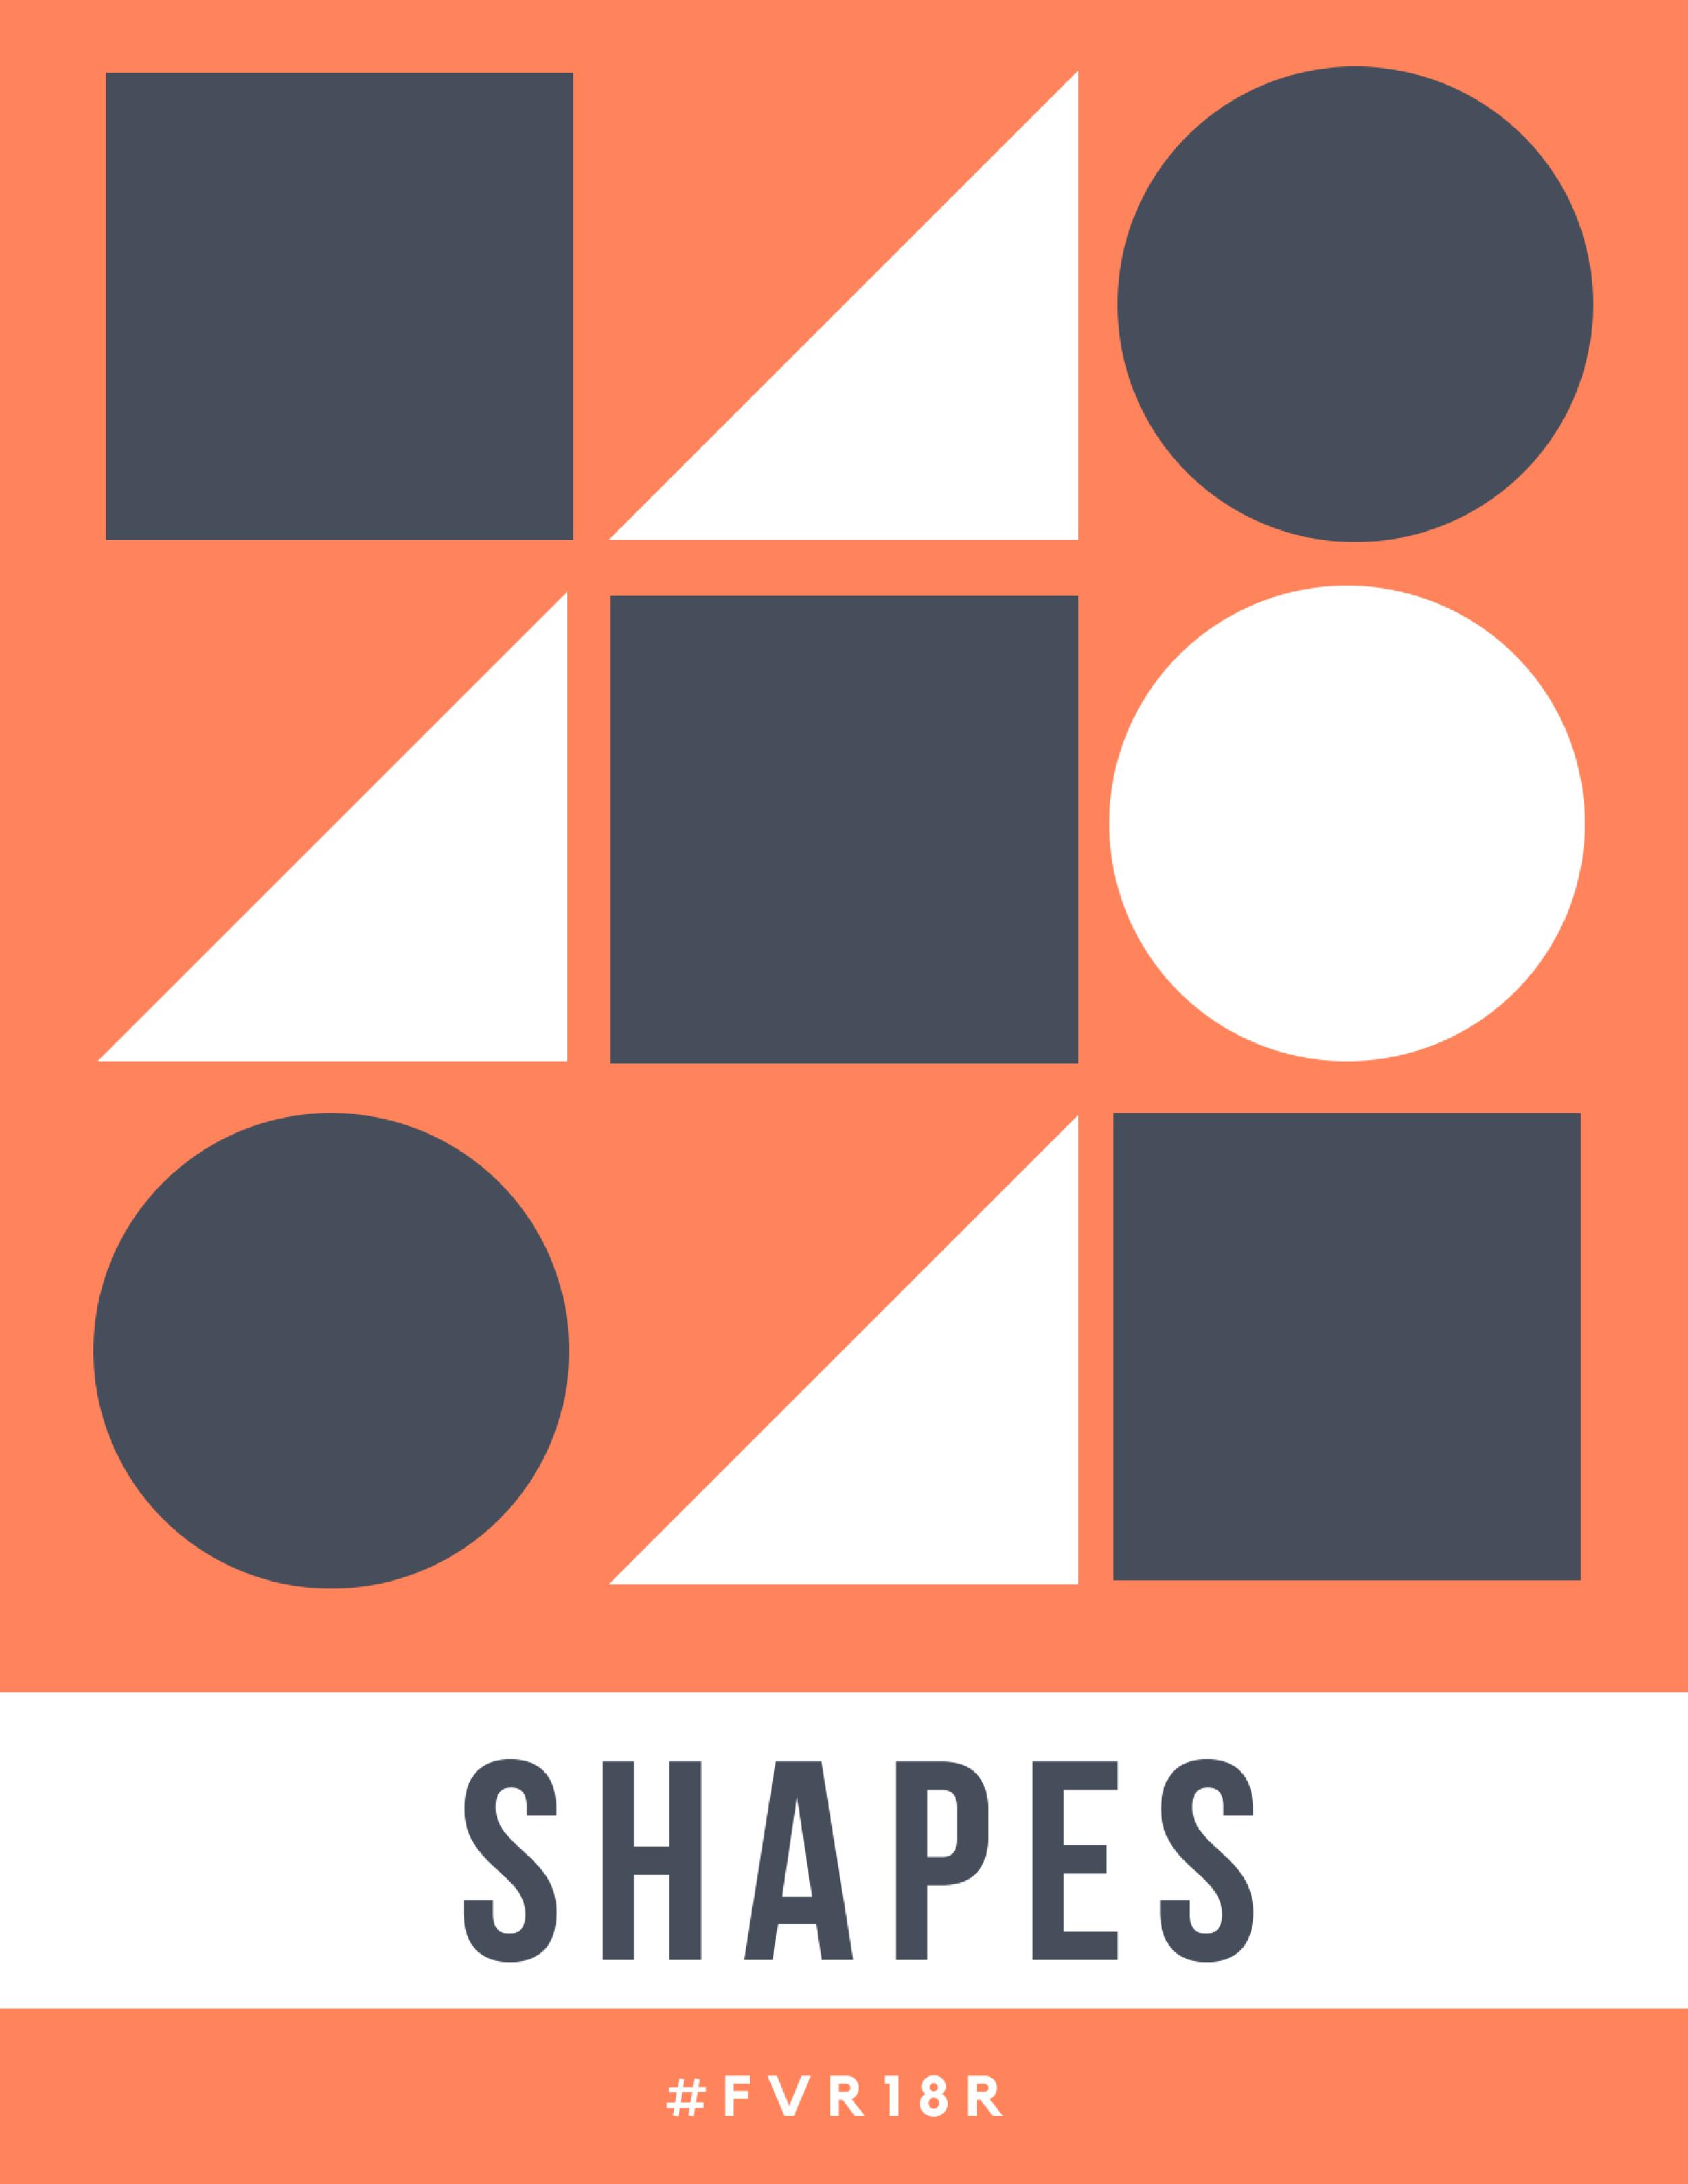 K-2 Library Signage, Shapes